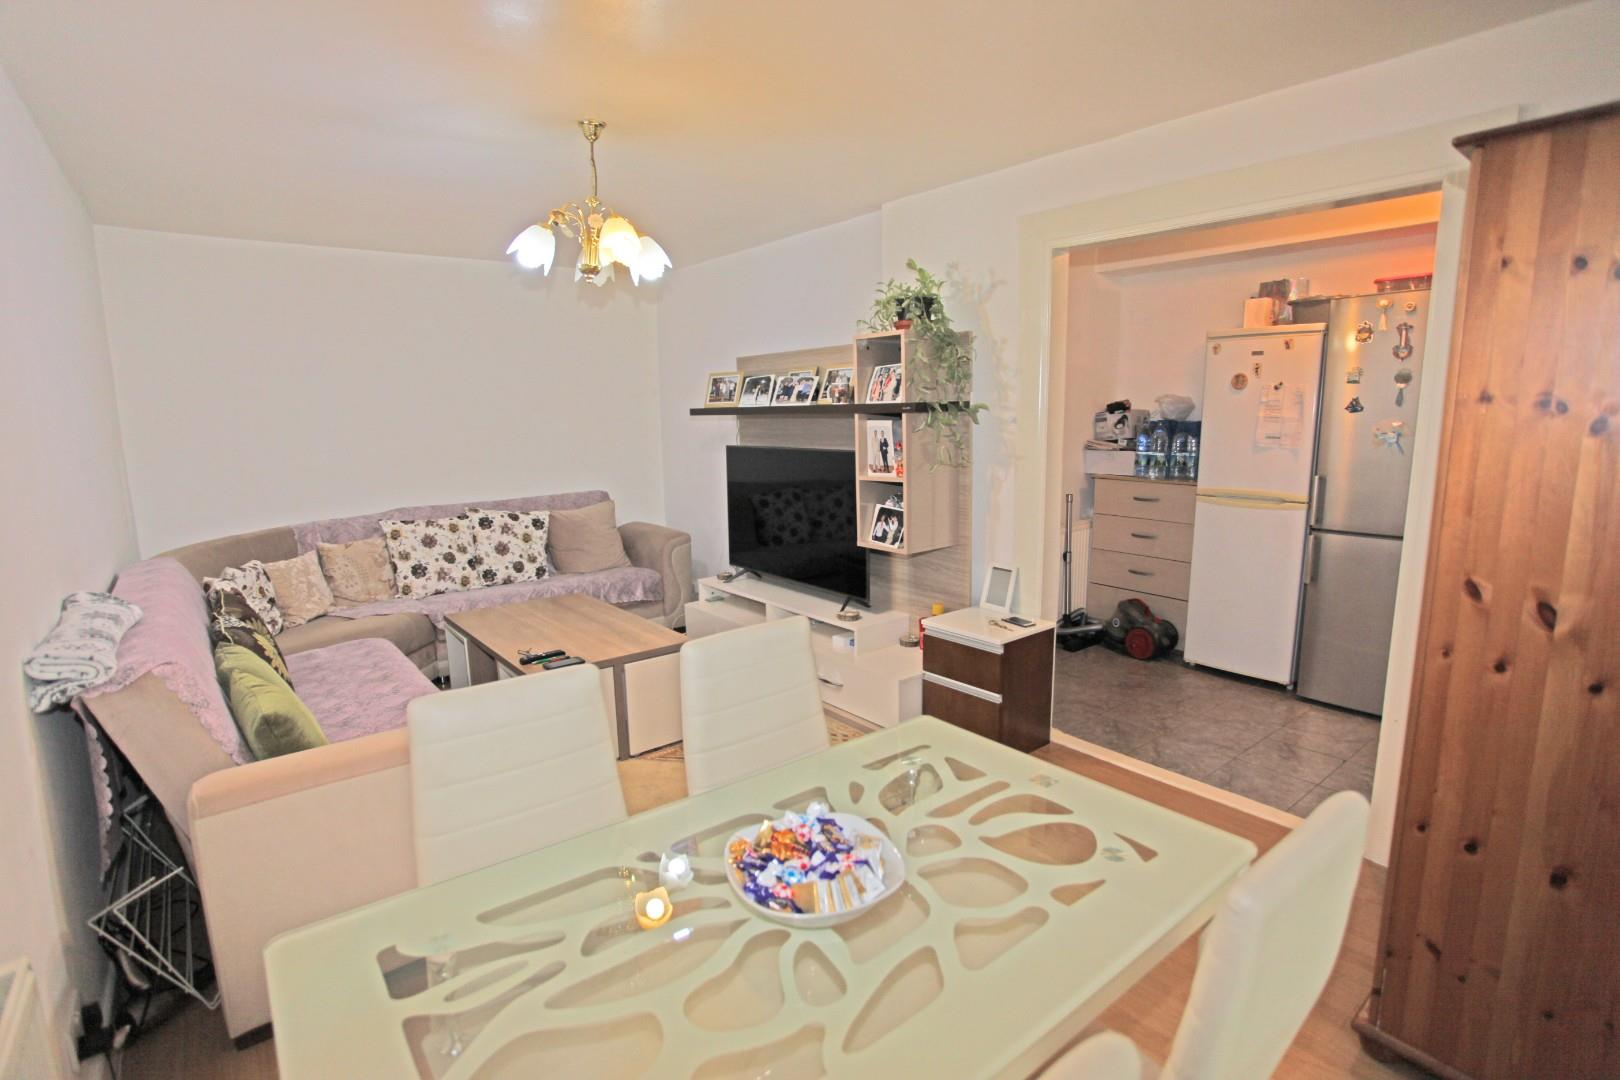 2 Bedroom Garden Flat For Sale on Caldy Walk